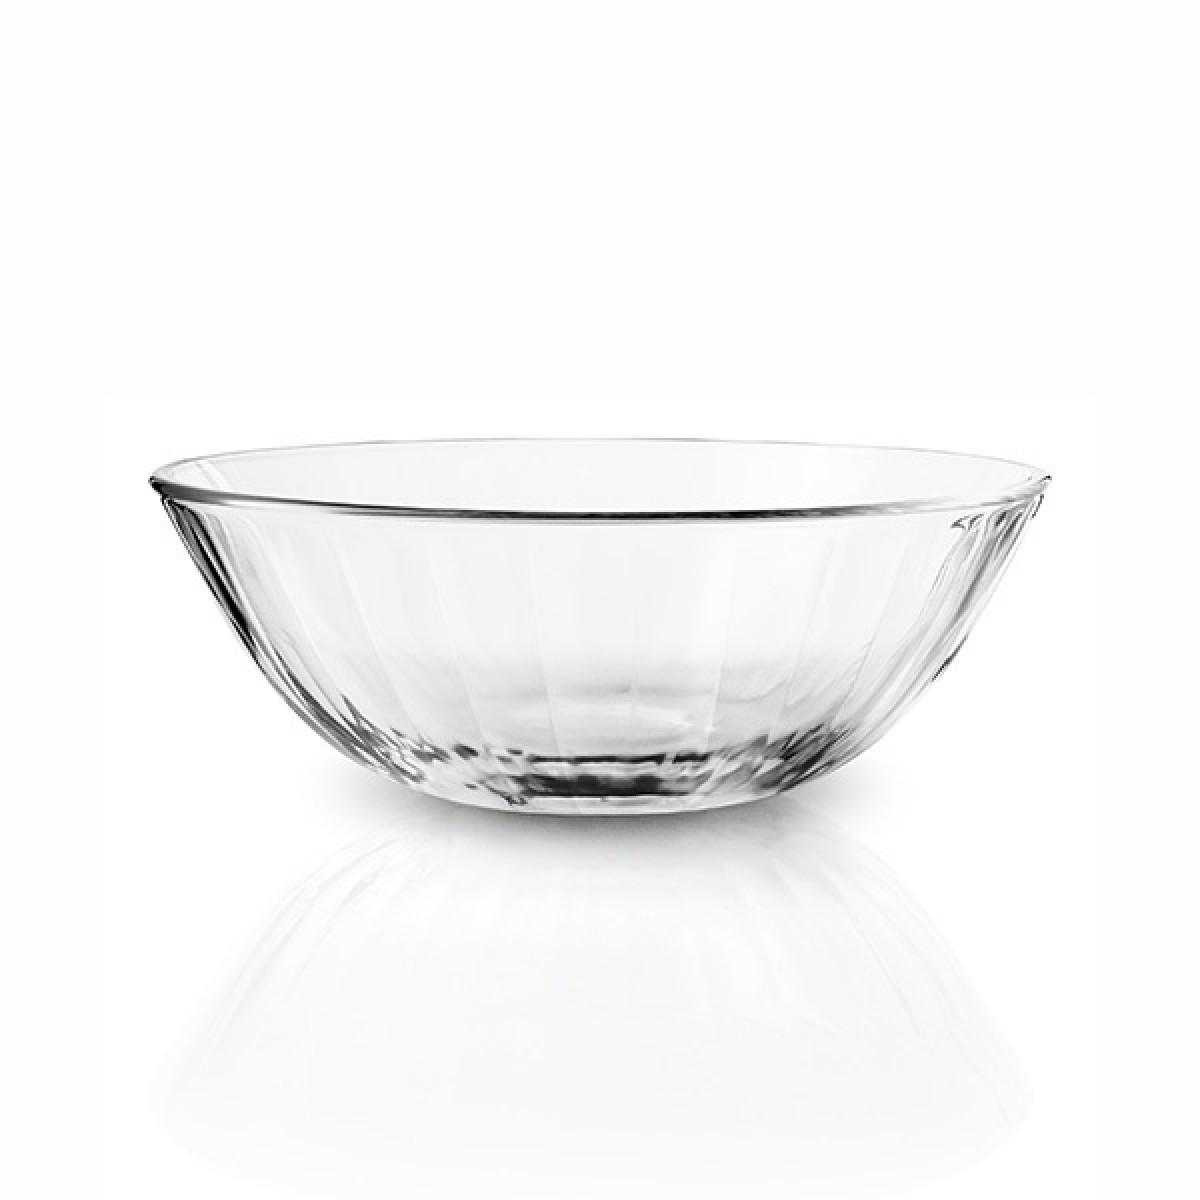 EVA SOLO Glasskåle 4 stk. 50 cl.